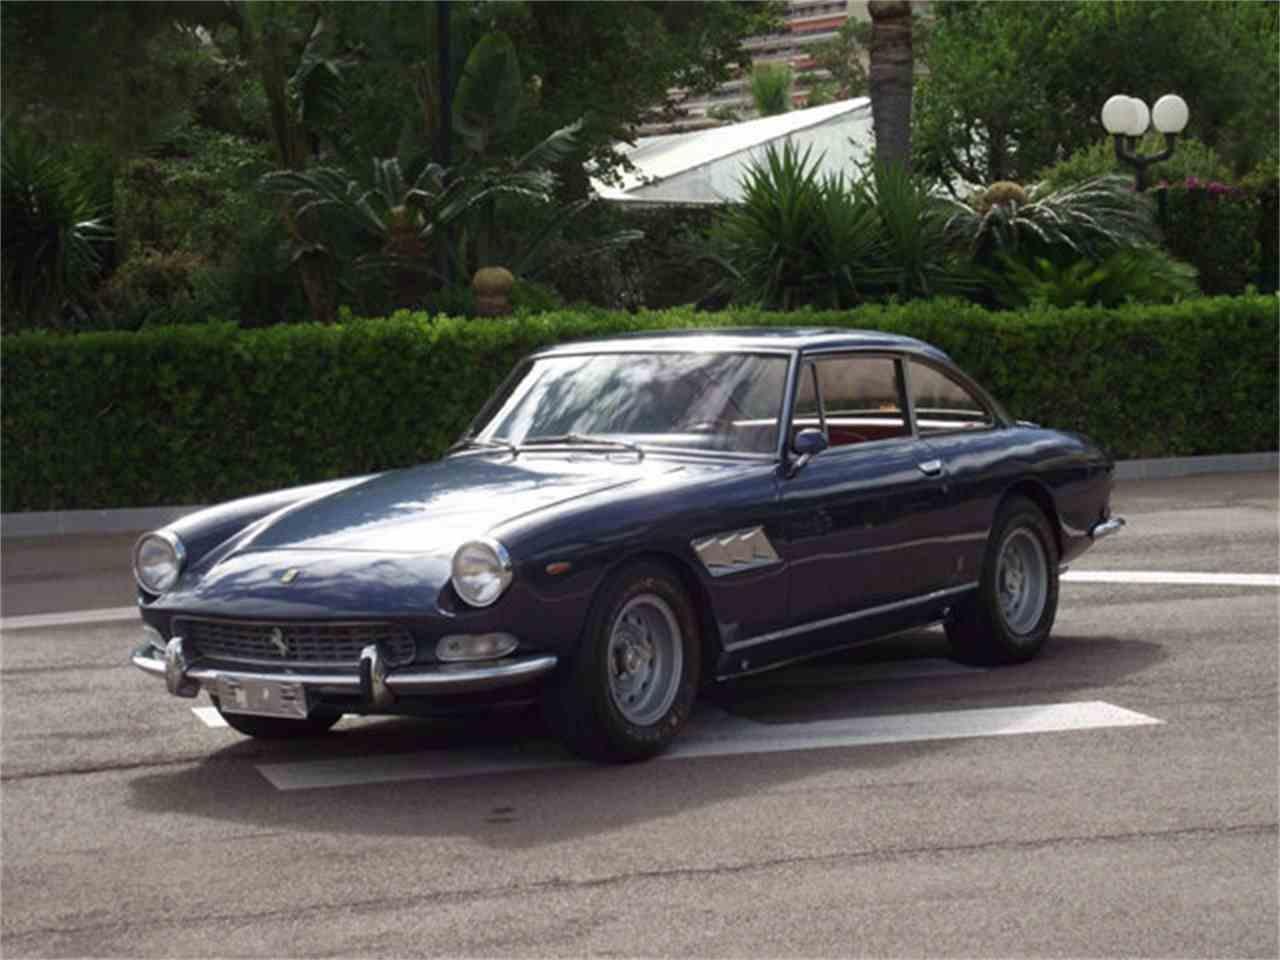 1965 to 1967 ferrari 330 gt for sale on classiccars 5 available 1966 ferrari 330 gt 986797 vanachro Images